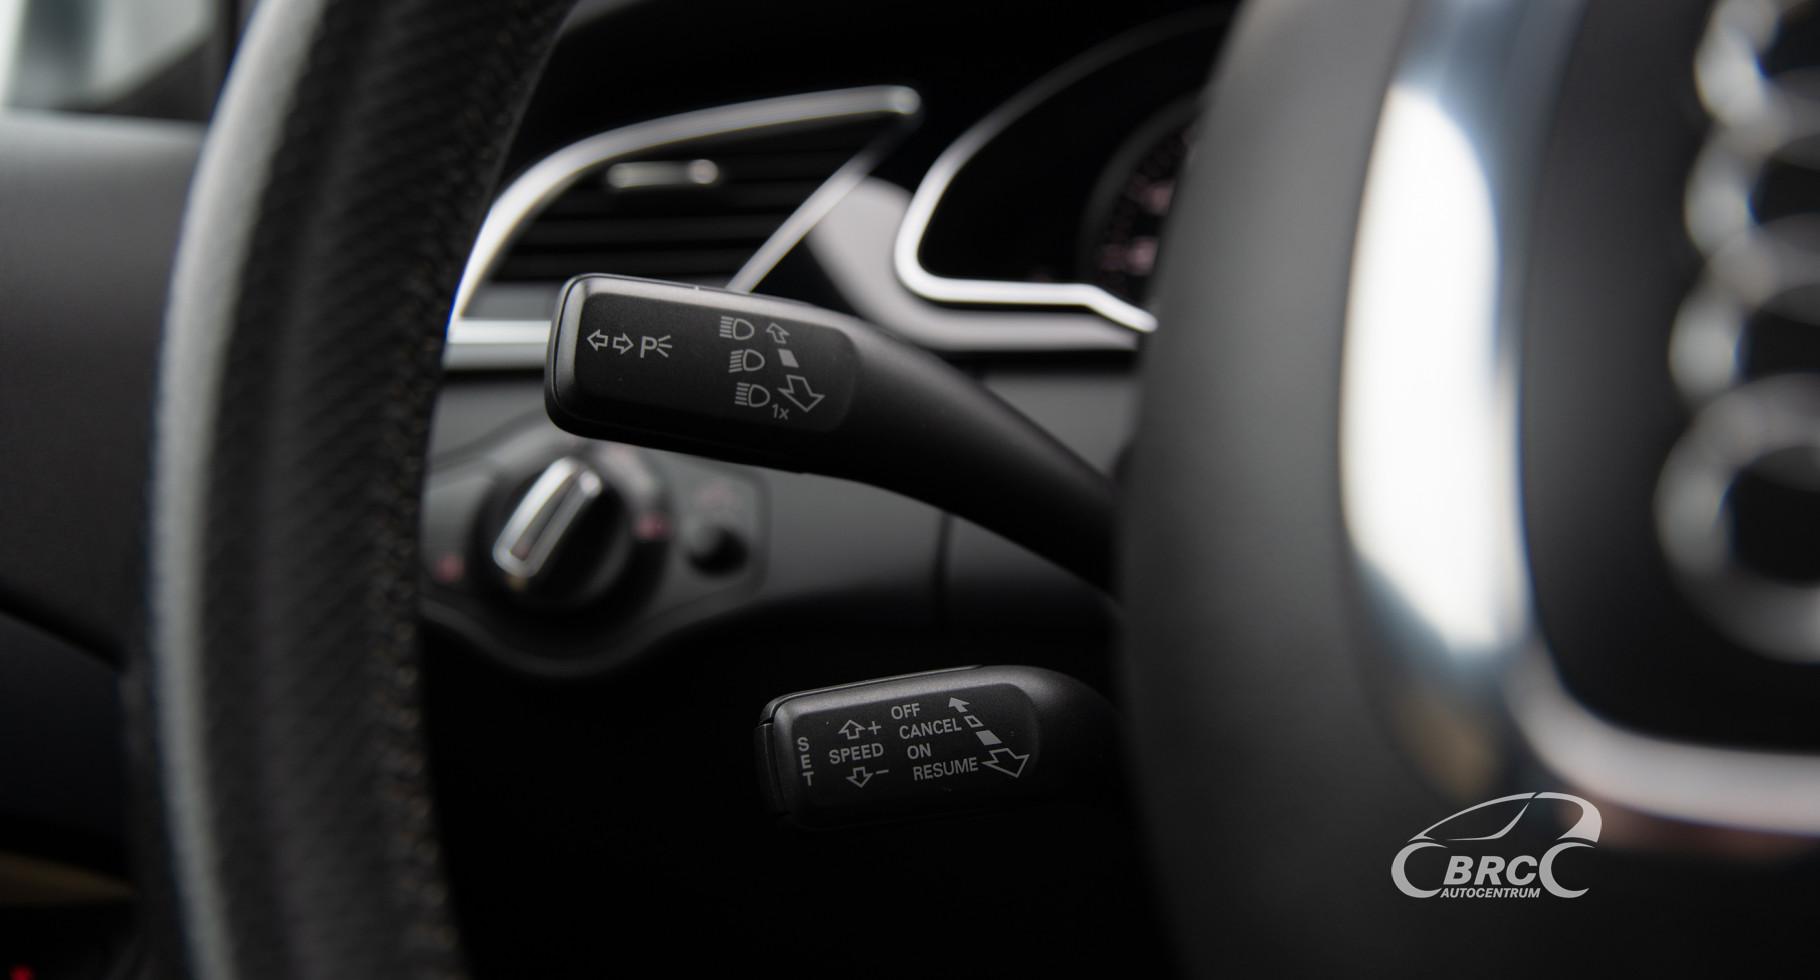 Audi RS5 Coupe Quattro 4.2 V8 A/T